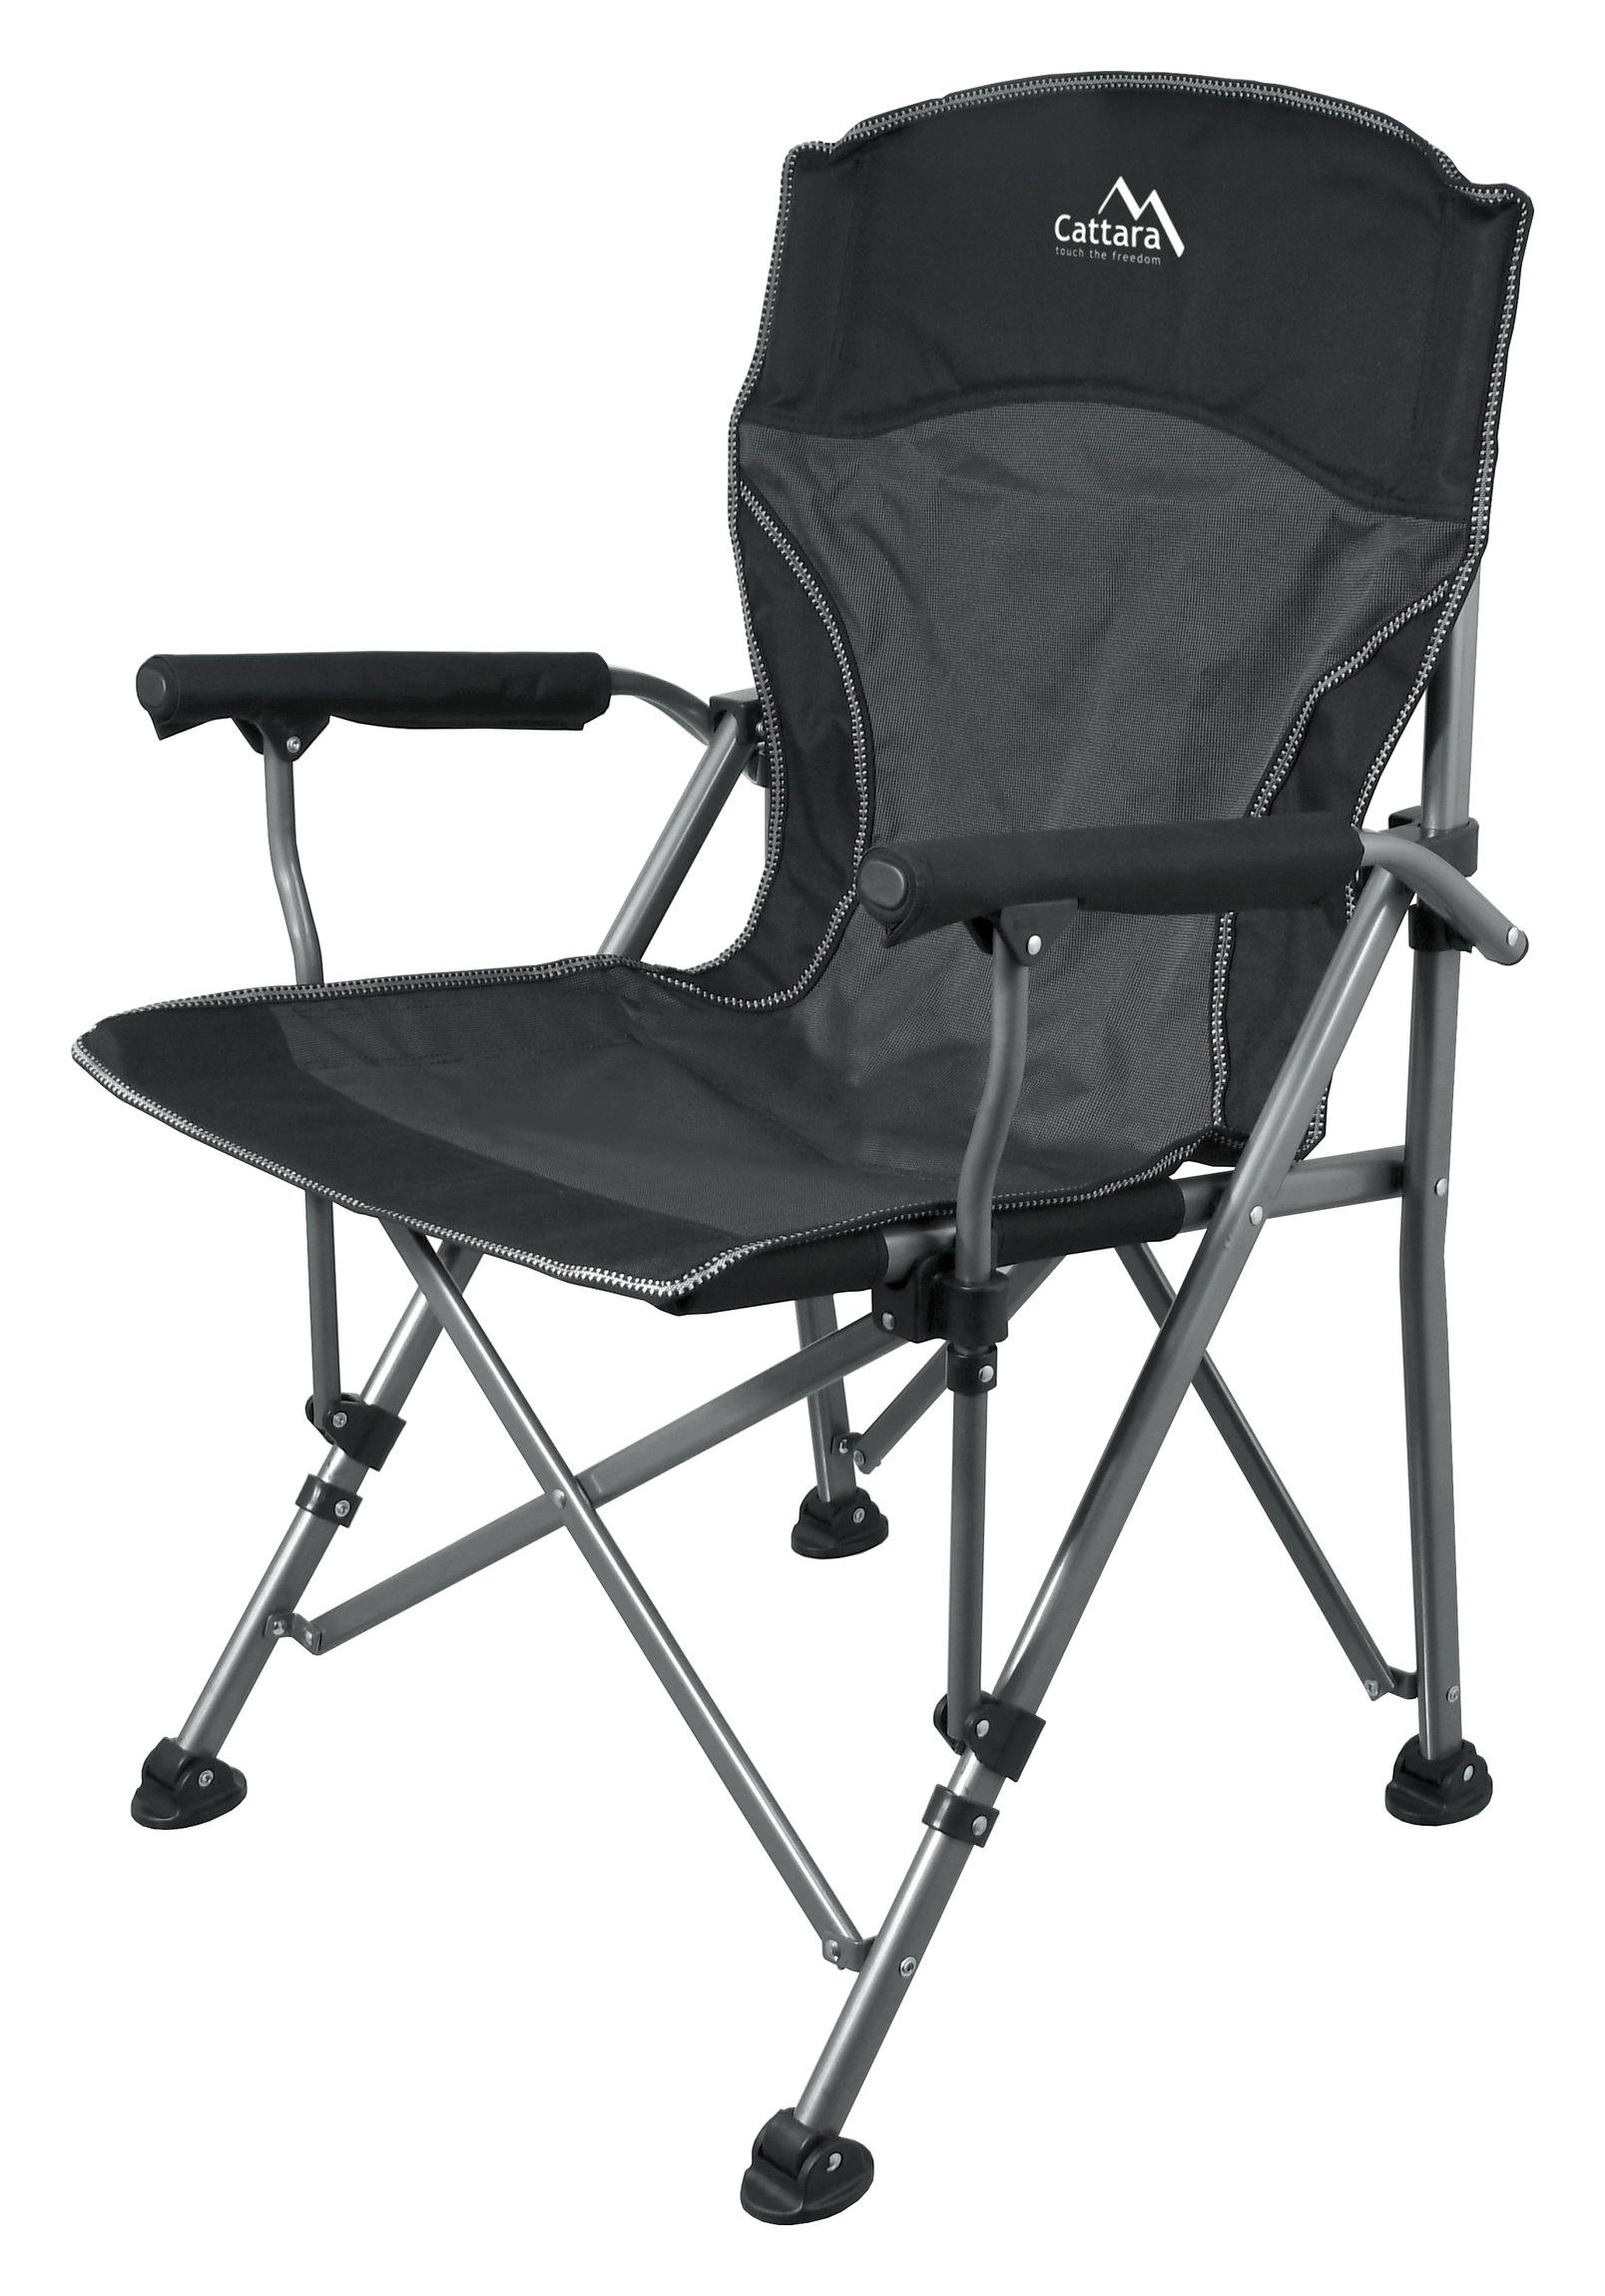 Cattara - Židle kempingová skládací MERIT XXL 95cm